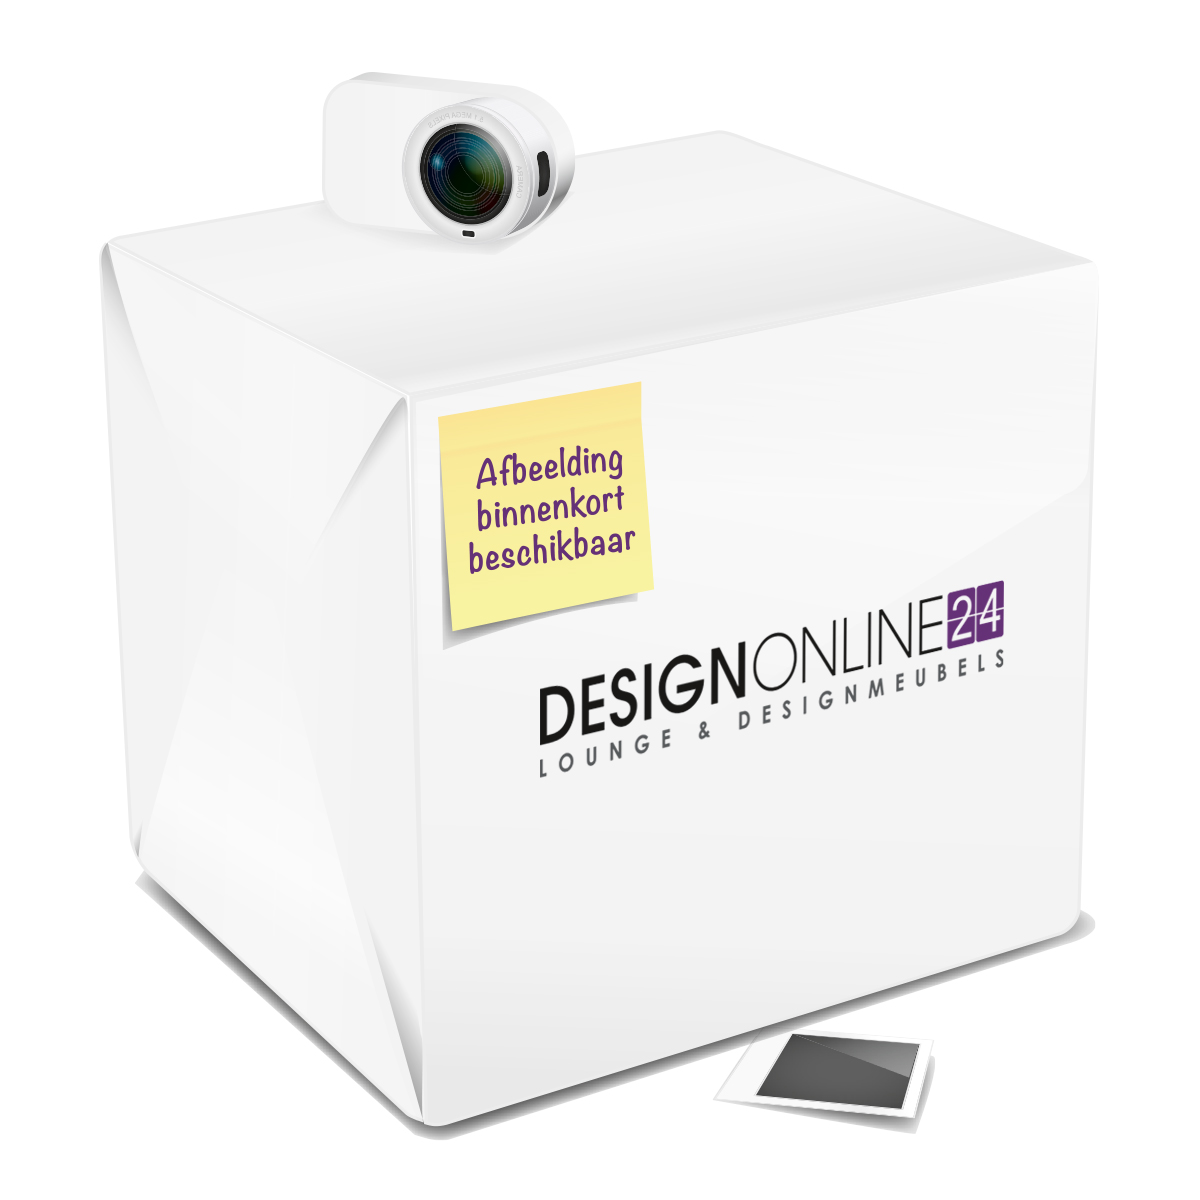 d-Bodhi Fendy Small Boekenrek Vakkenkast - L80 x B40 x H180 - Teakhout + Gratis Design Tafellamp twv € 79,95